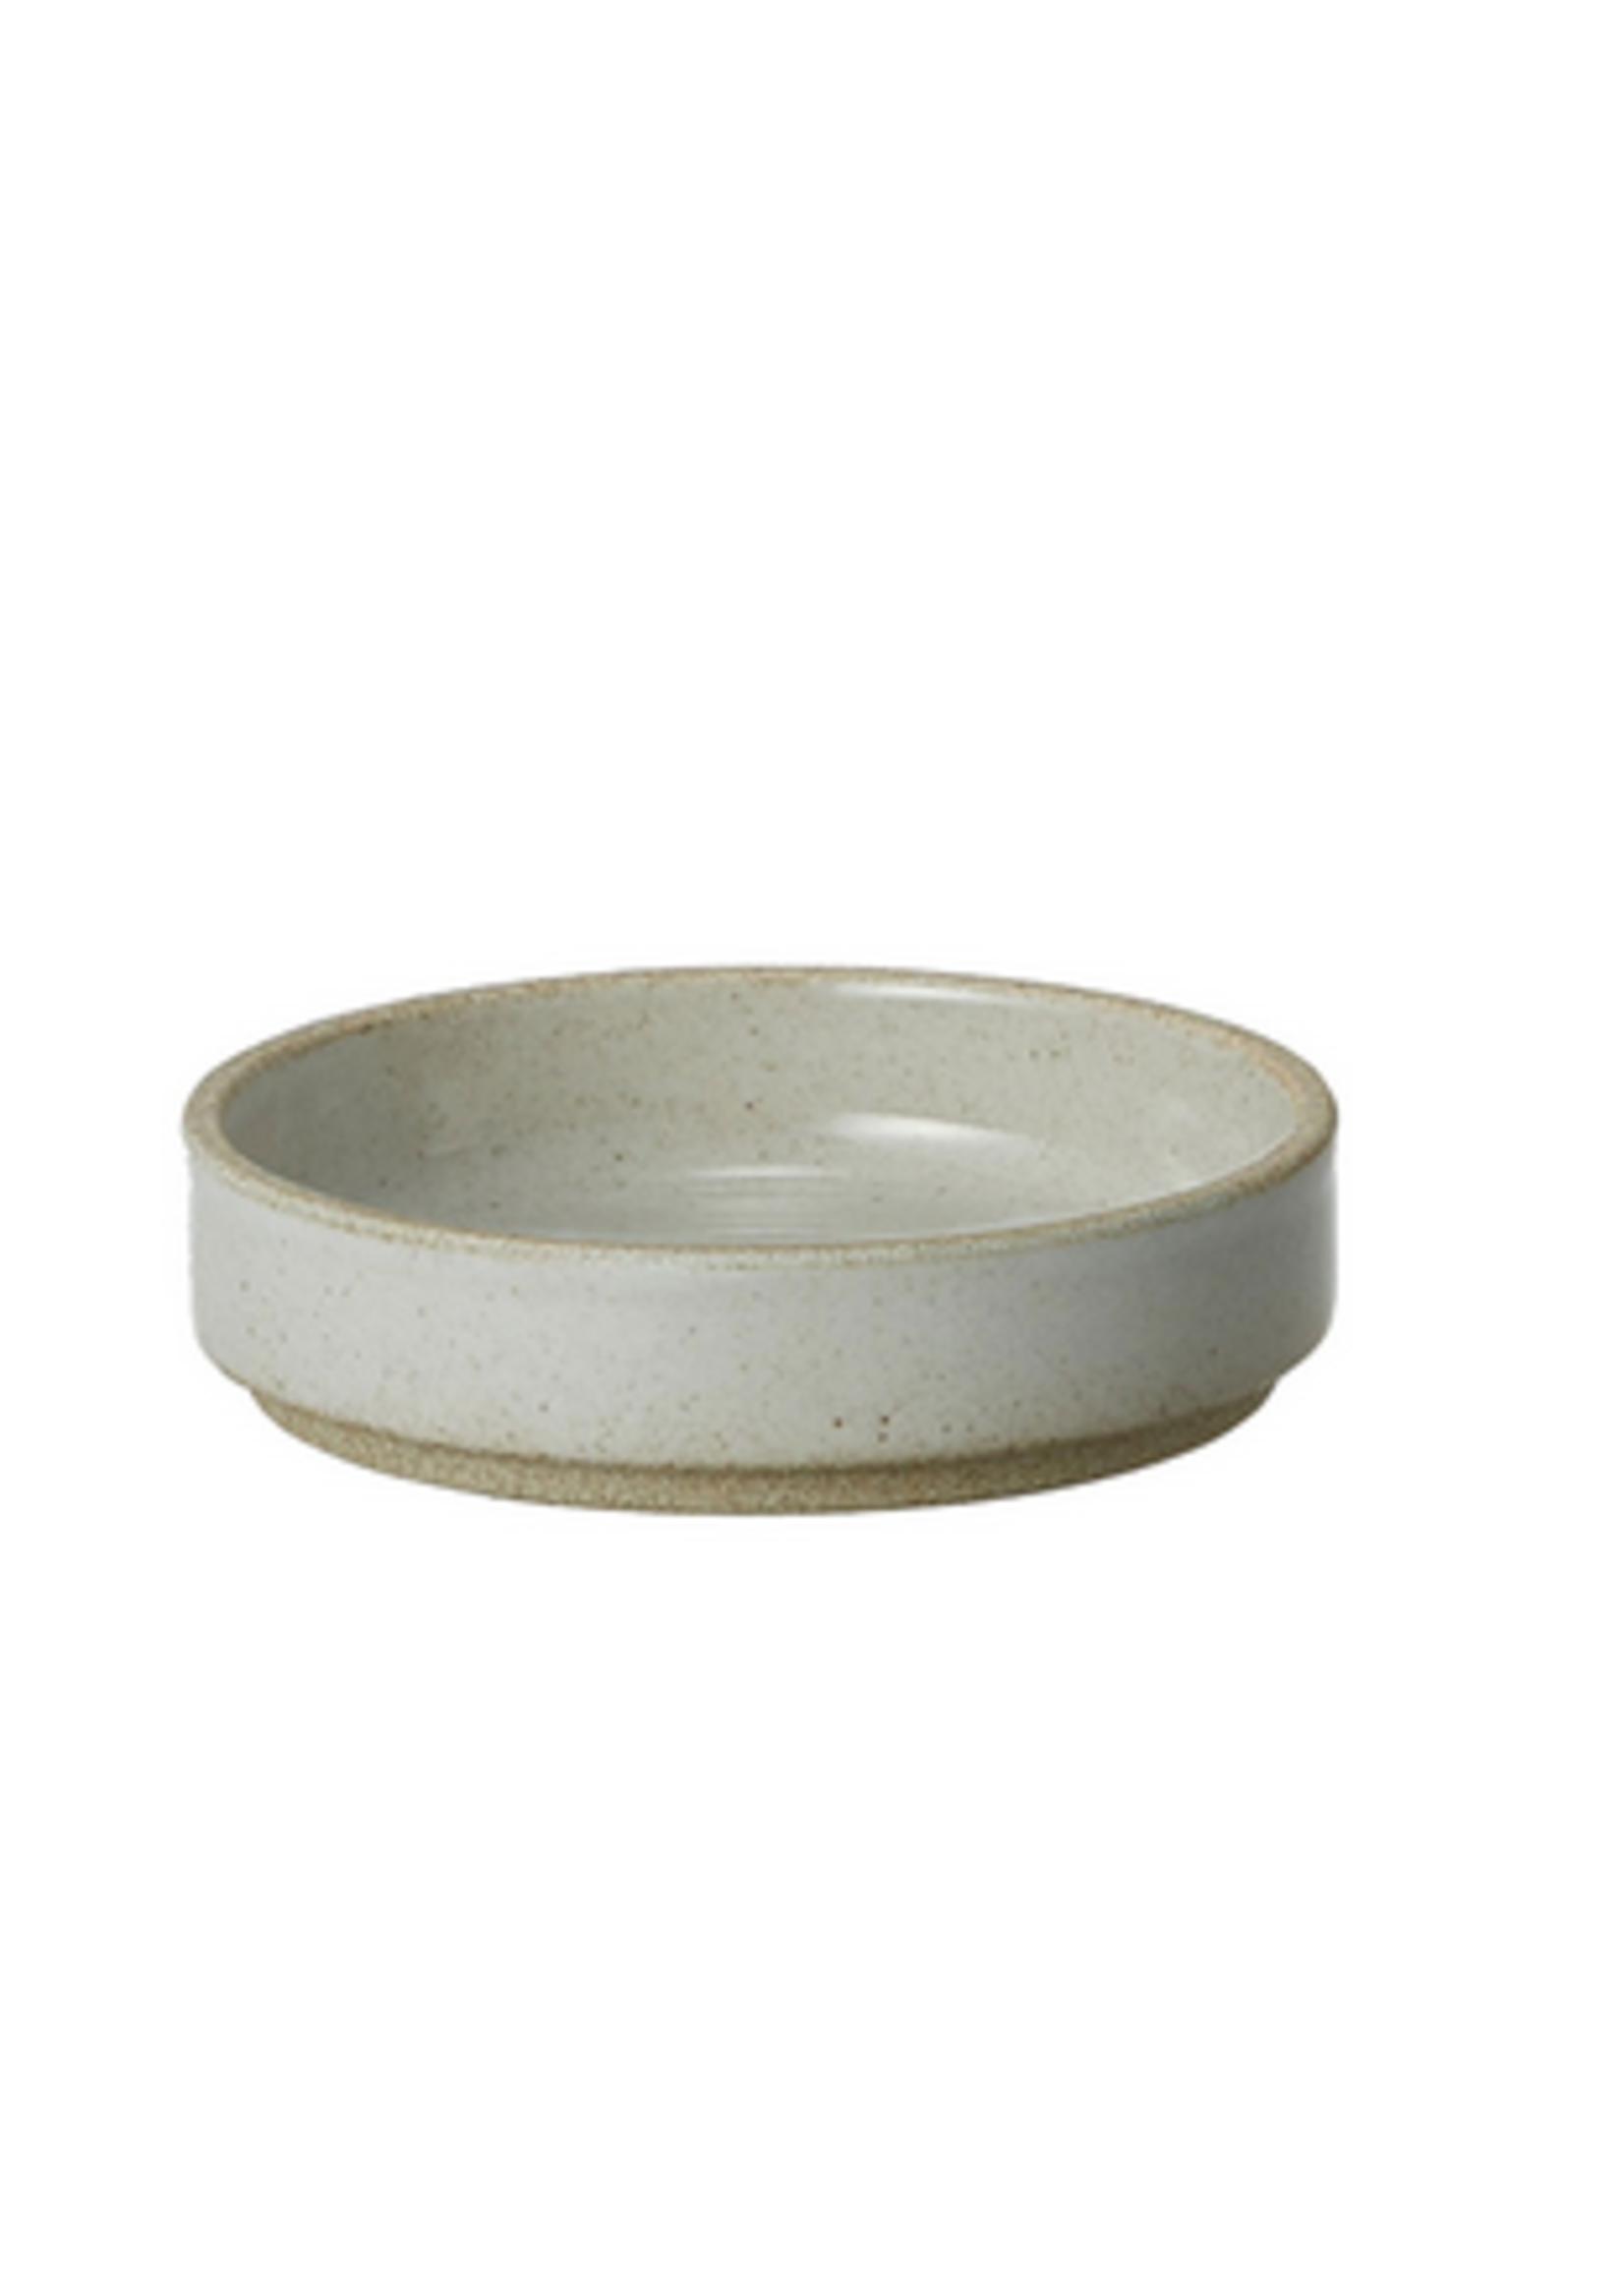 Hasami Plate  - natural  HPM001